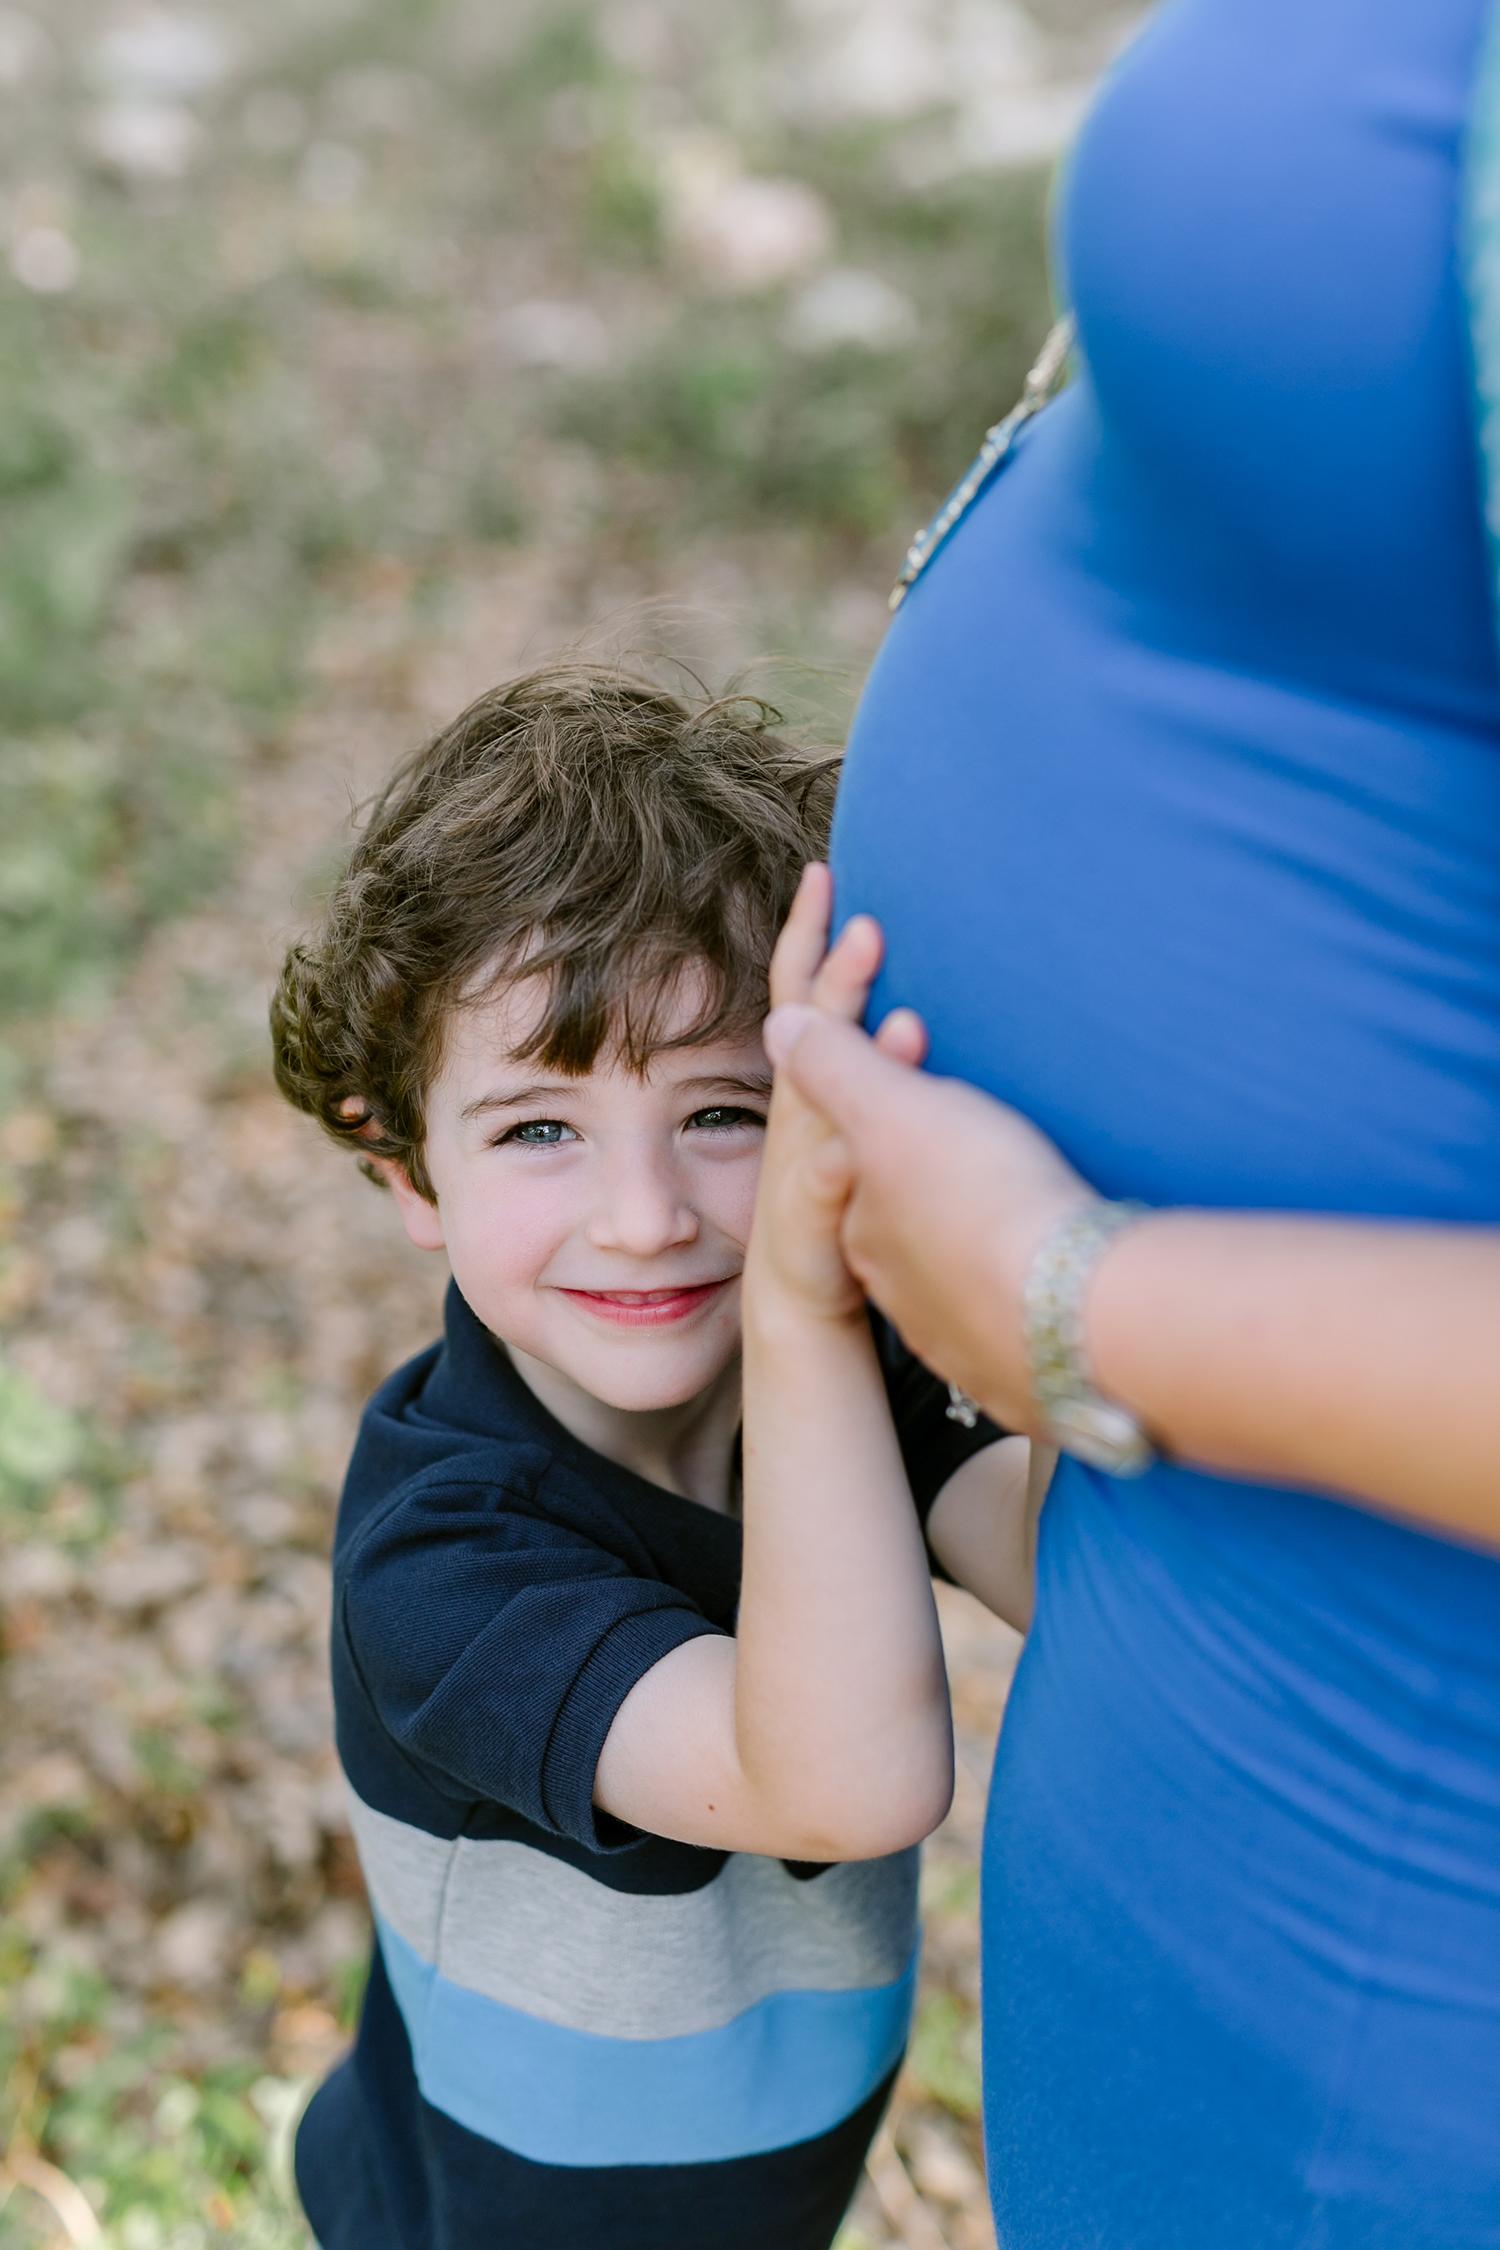 austin-tx-maternity-bump-photographer-07.jpg